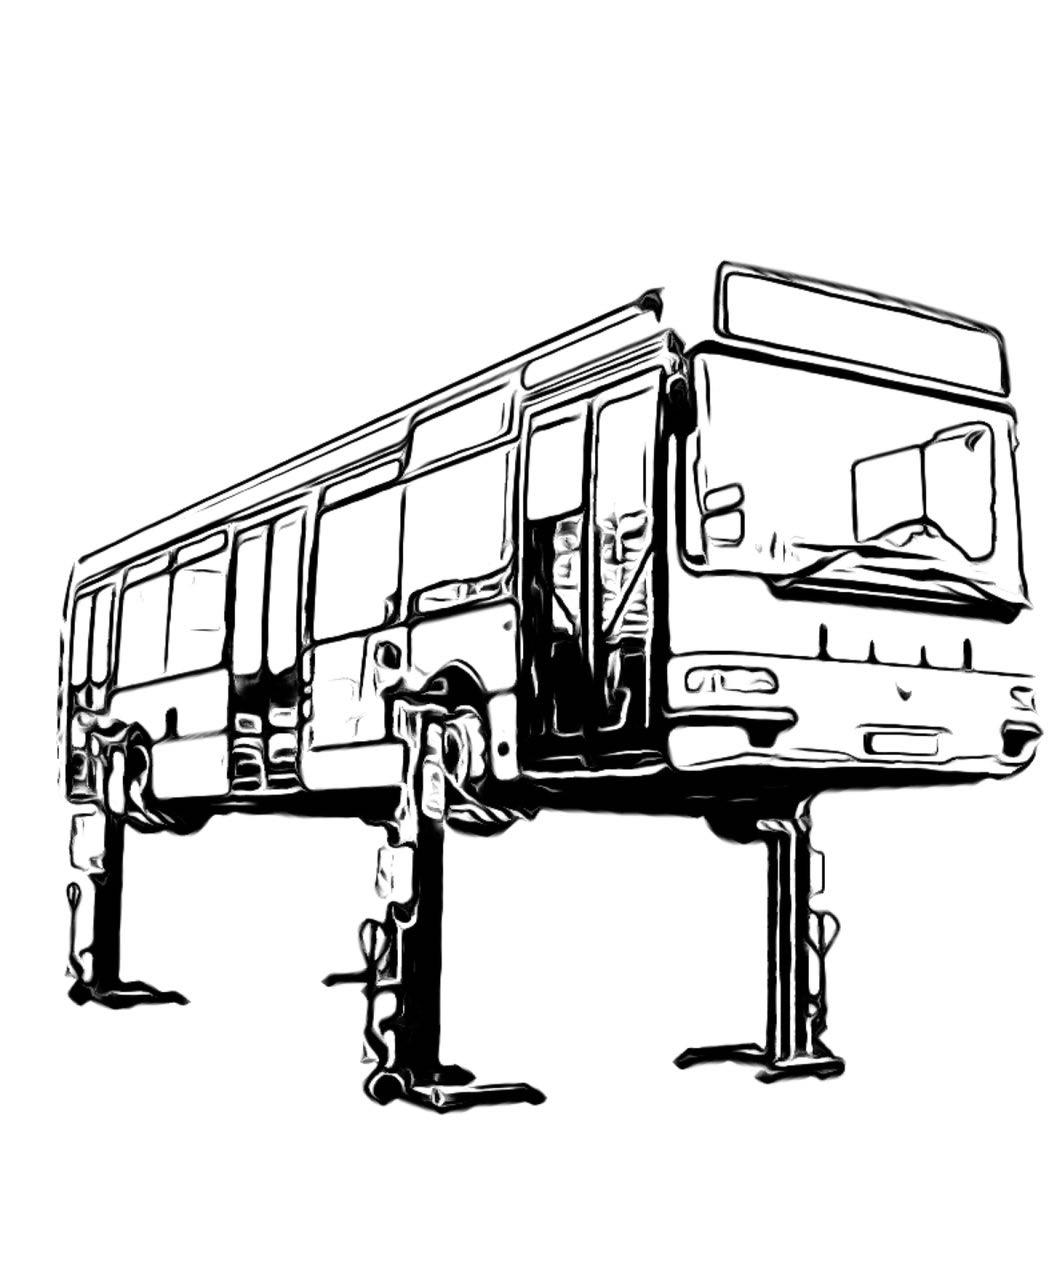 جک اتوبوس و ماشین سنگین